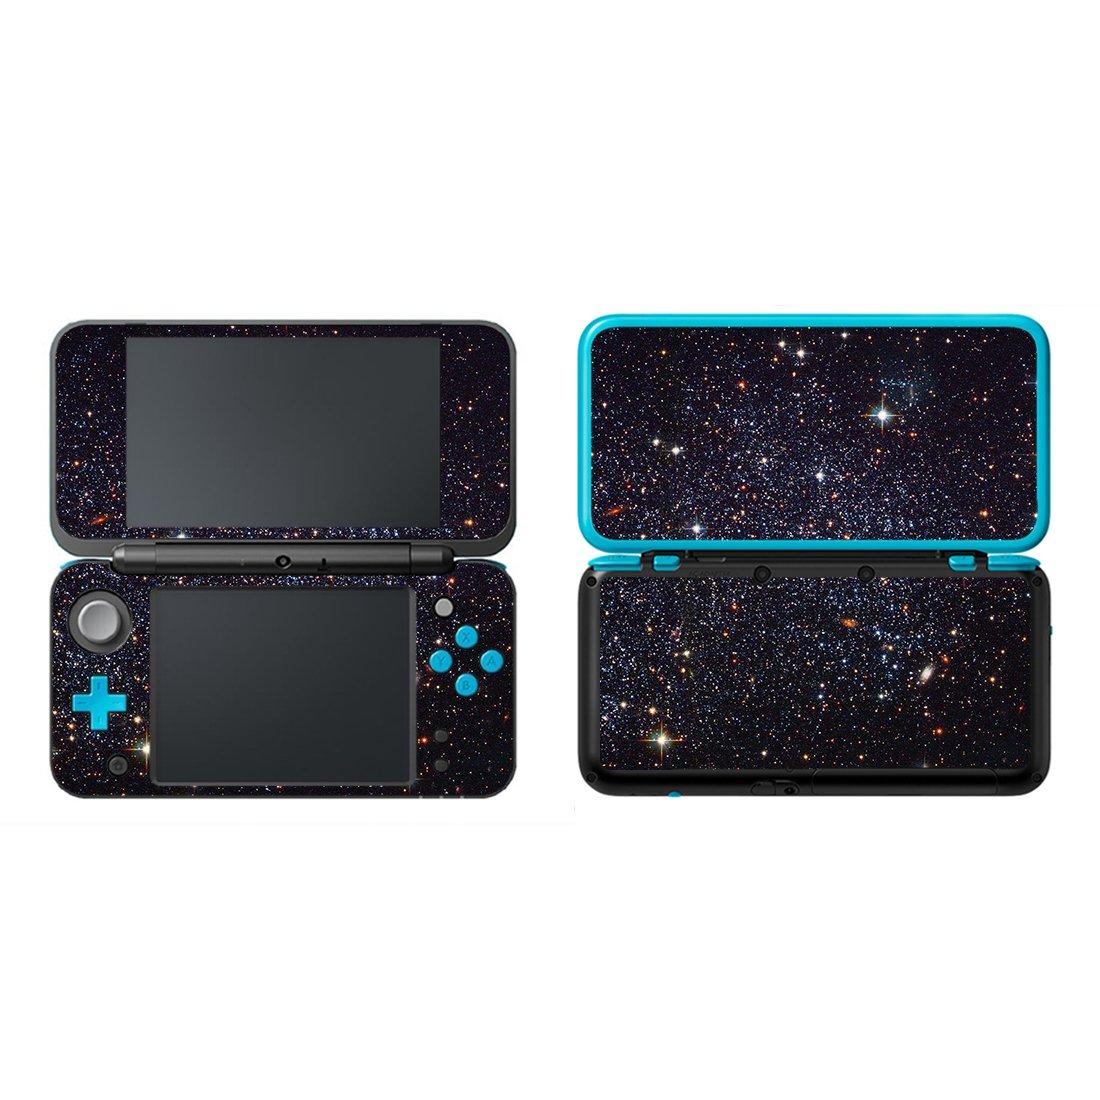 eSeeking Vinyl Cover Decals Skin Sticker for New Nintendo 2DS XL / LL - Clusters Stars